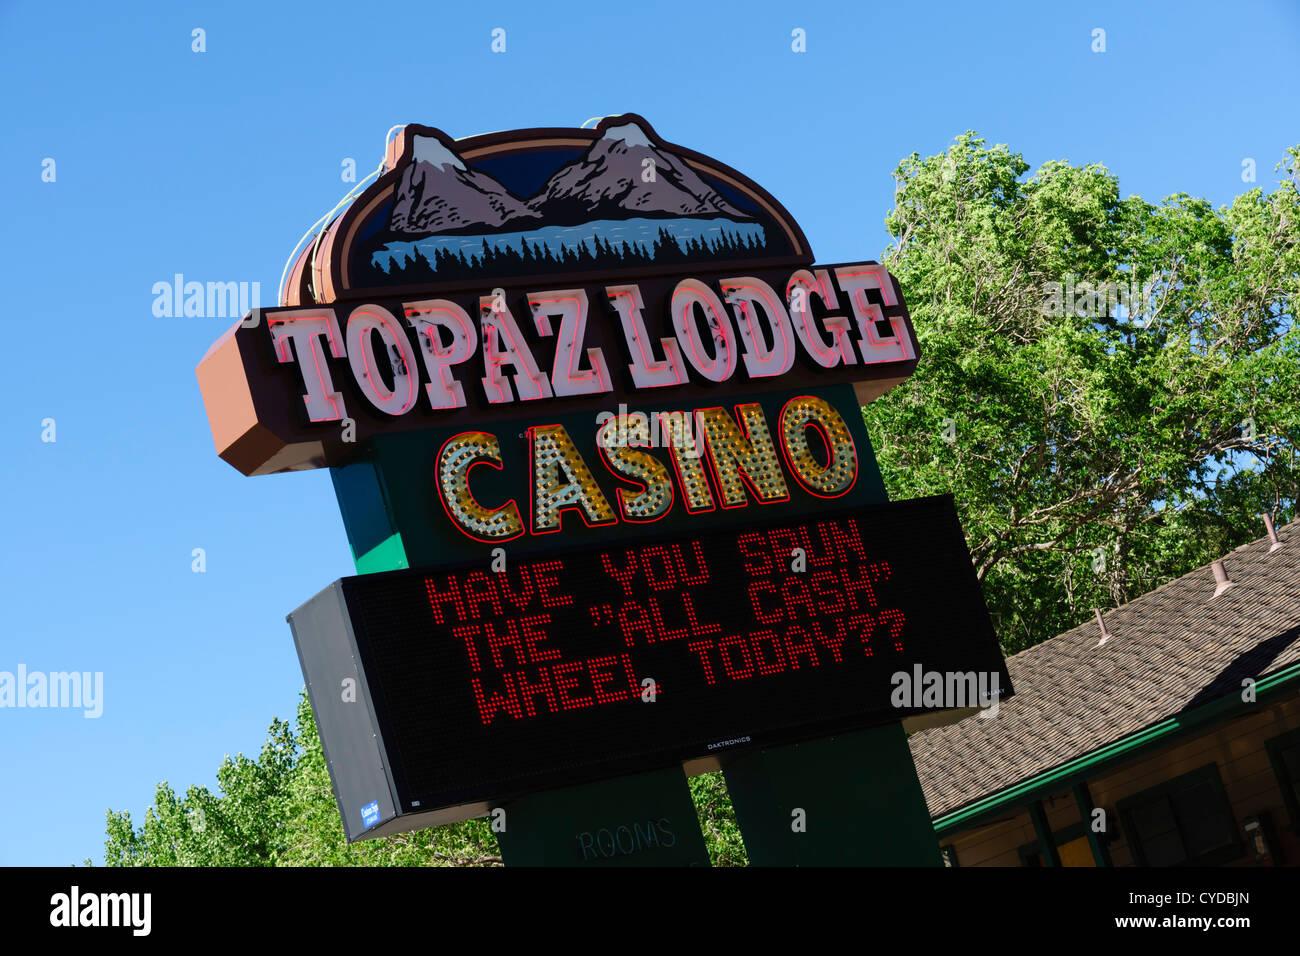 Indian casino in California - Topaz Lodge, gambling near Topaz Lake. - Stock Image